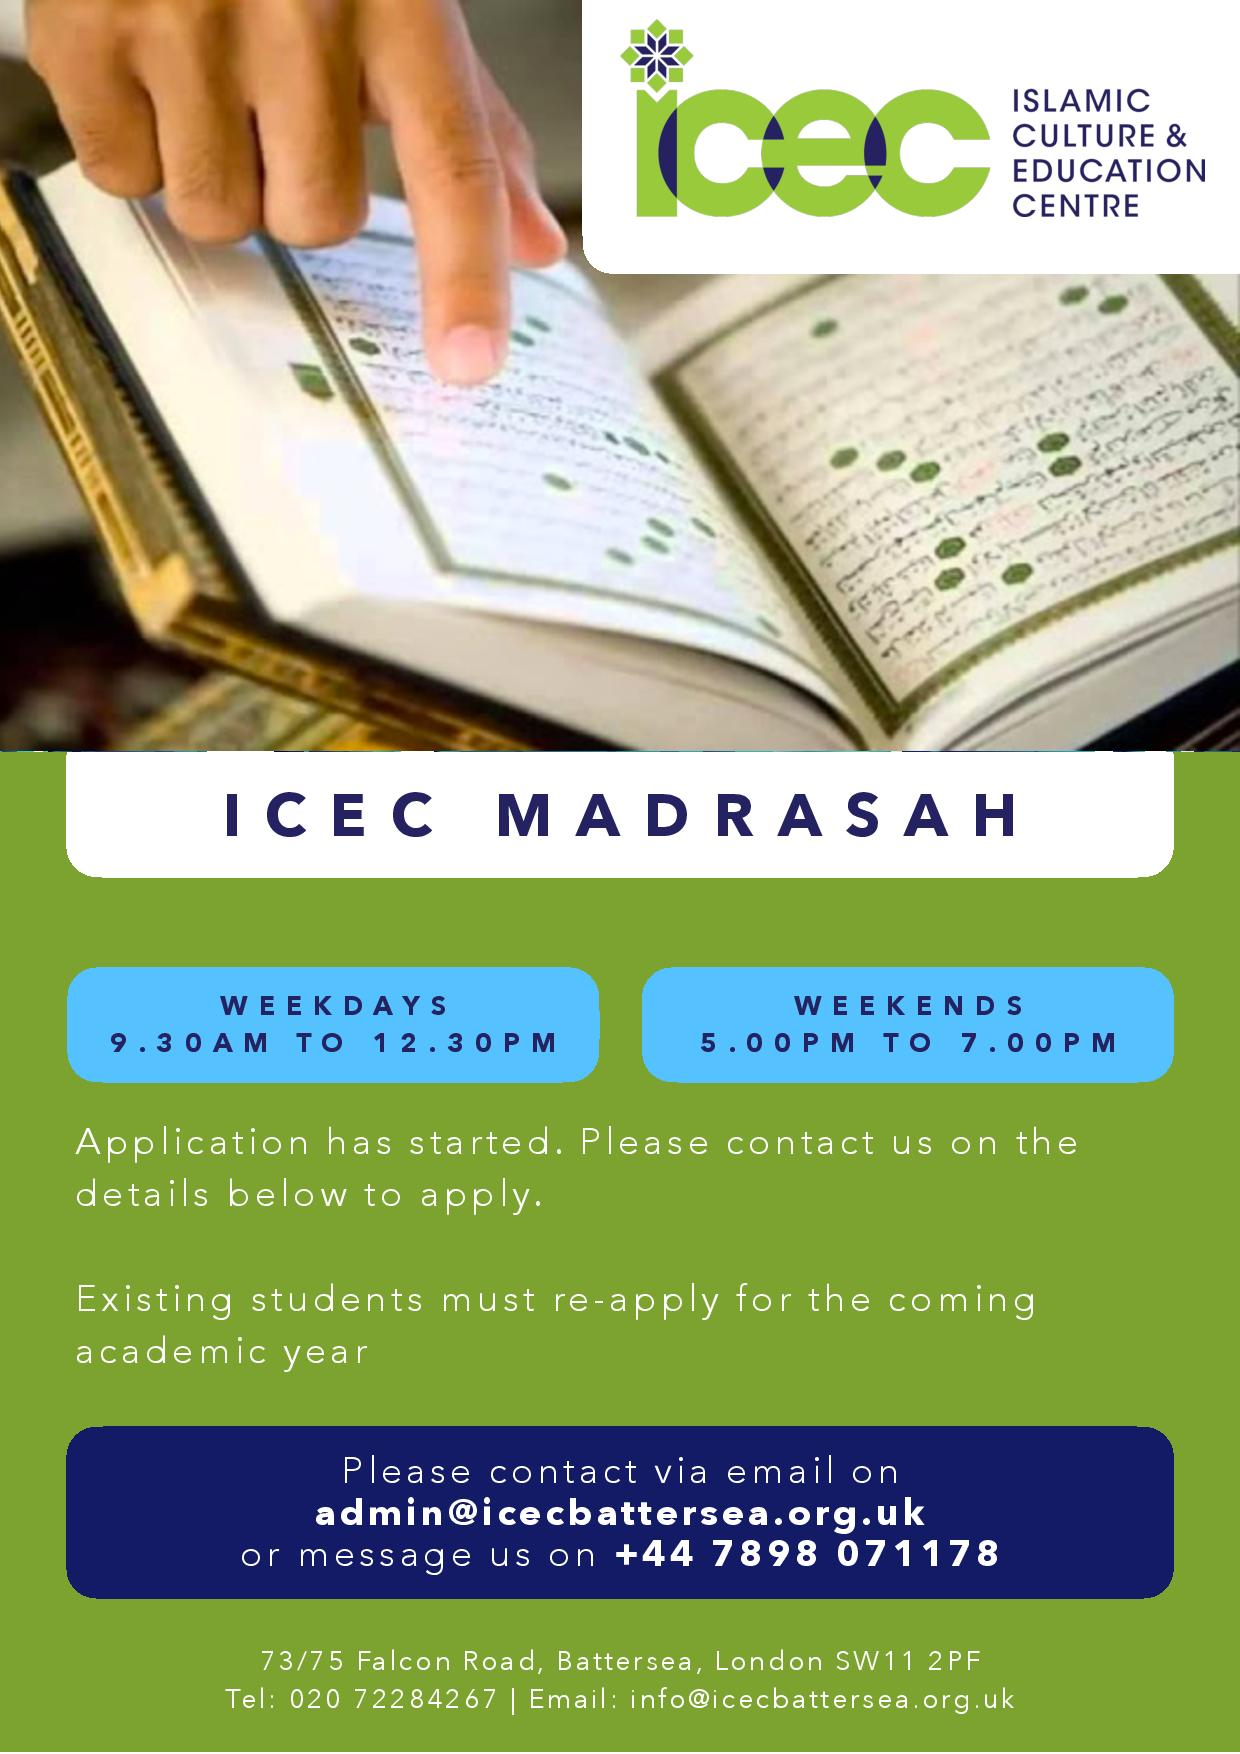 ICEC-Madrasah-1-page-0011601